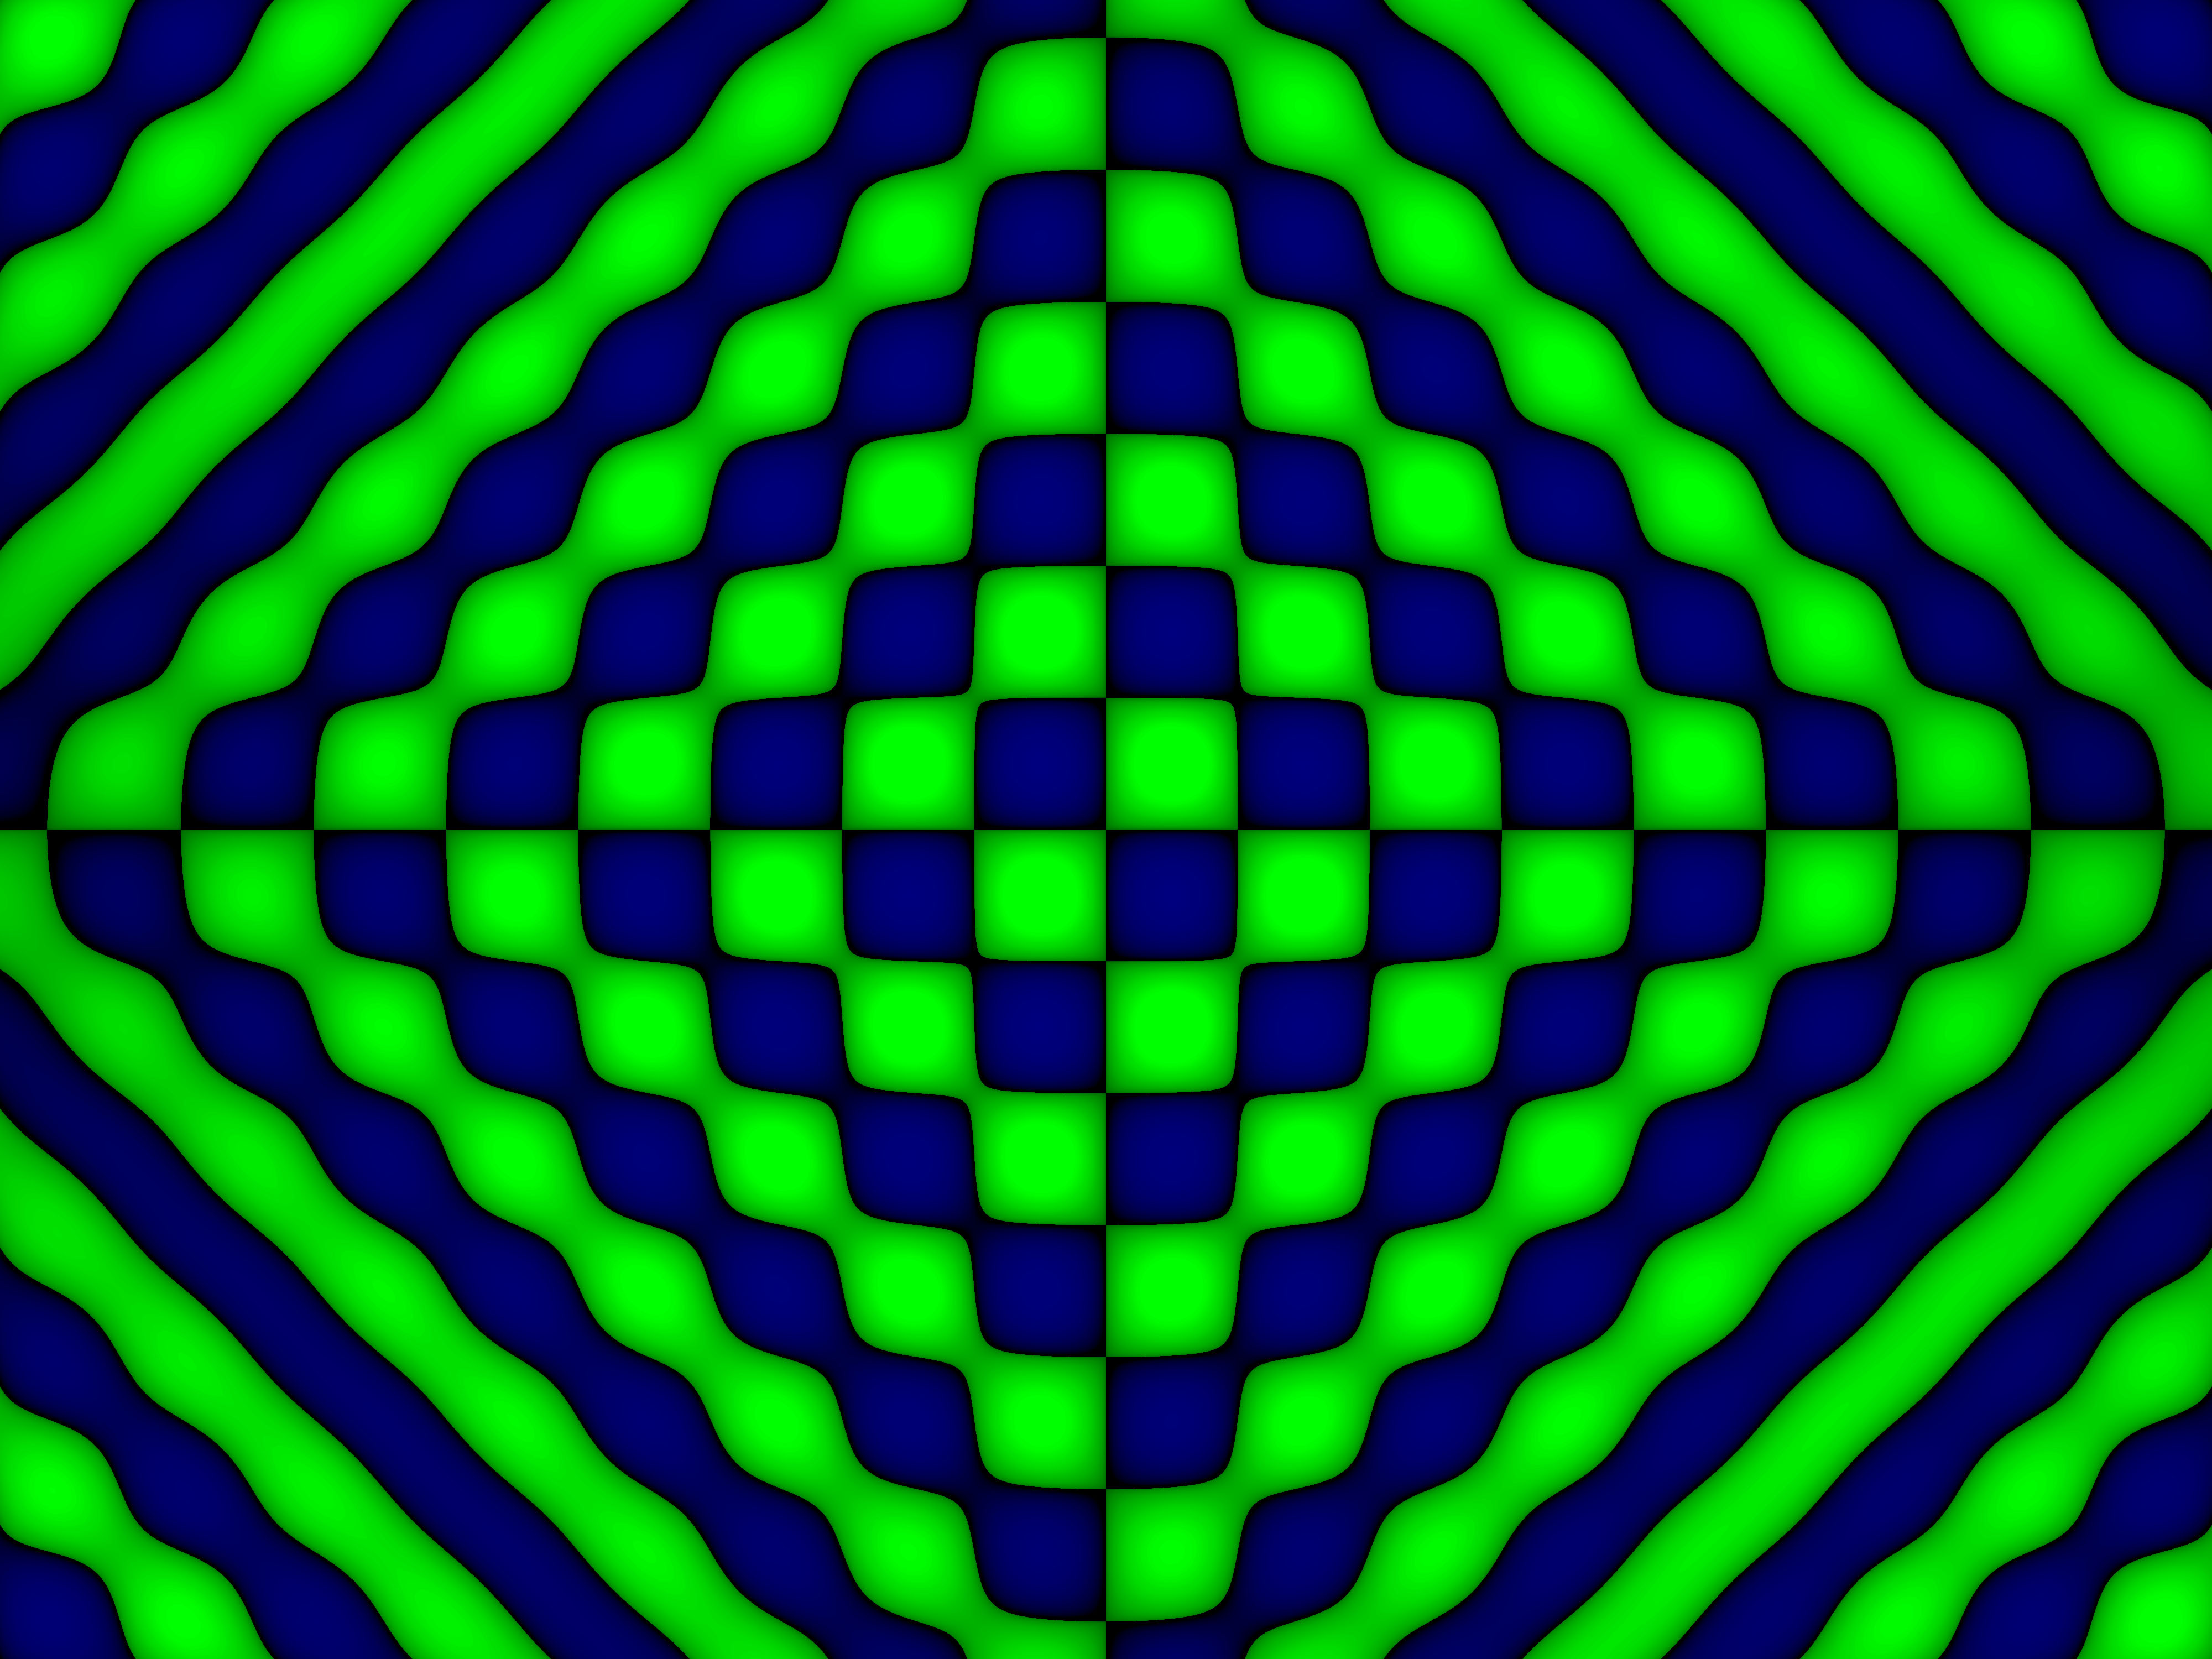 Digital Art Colorful 4000x3000